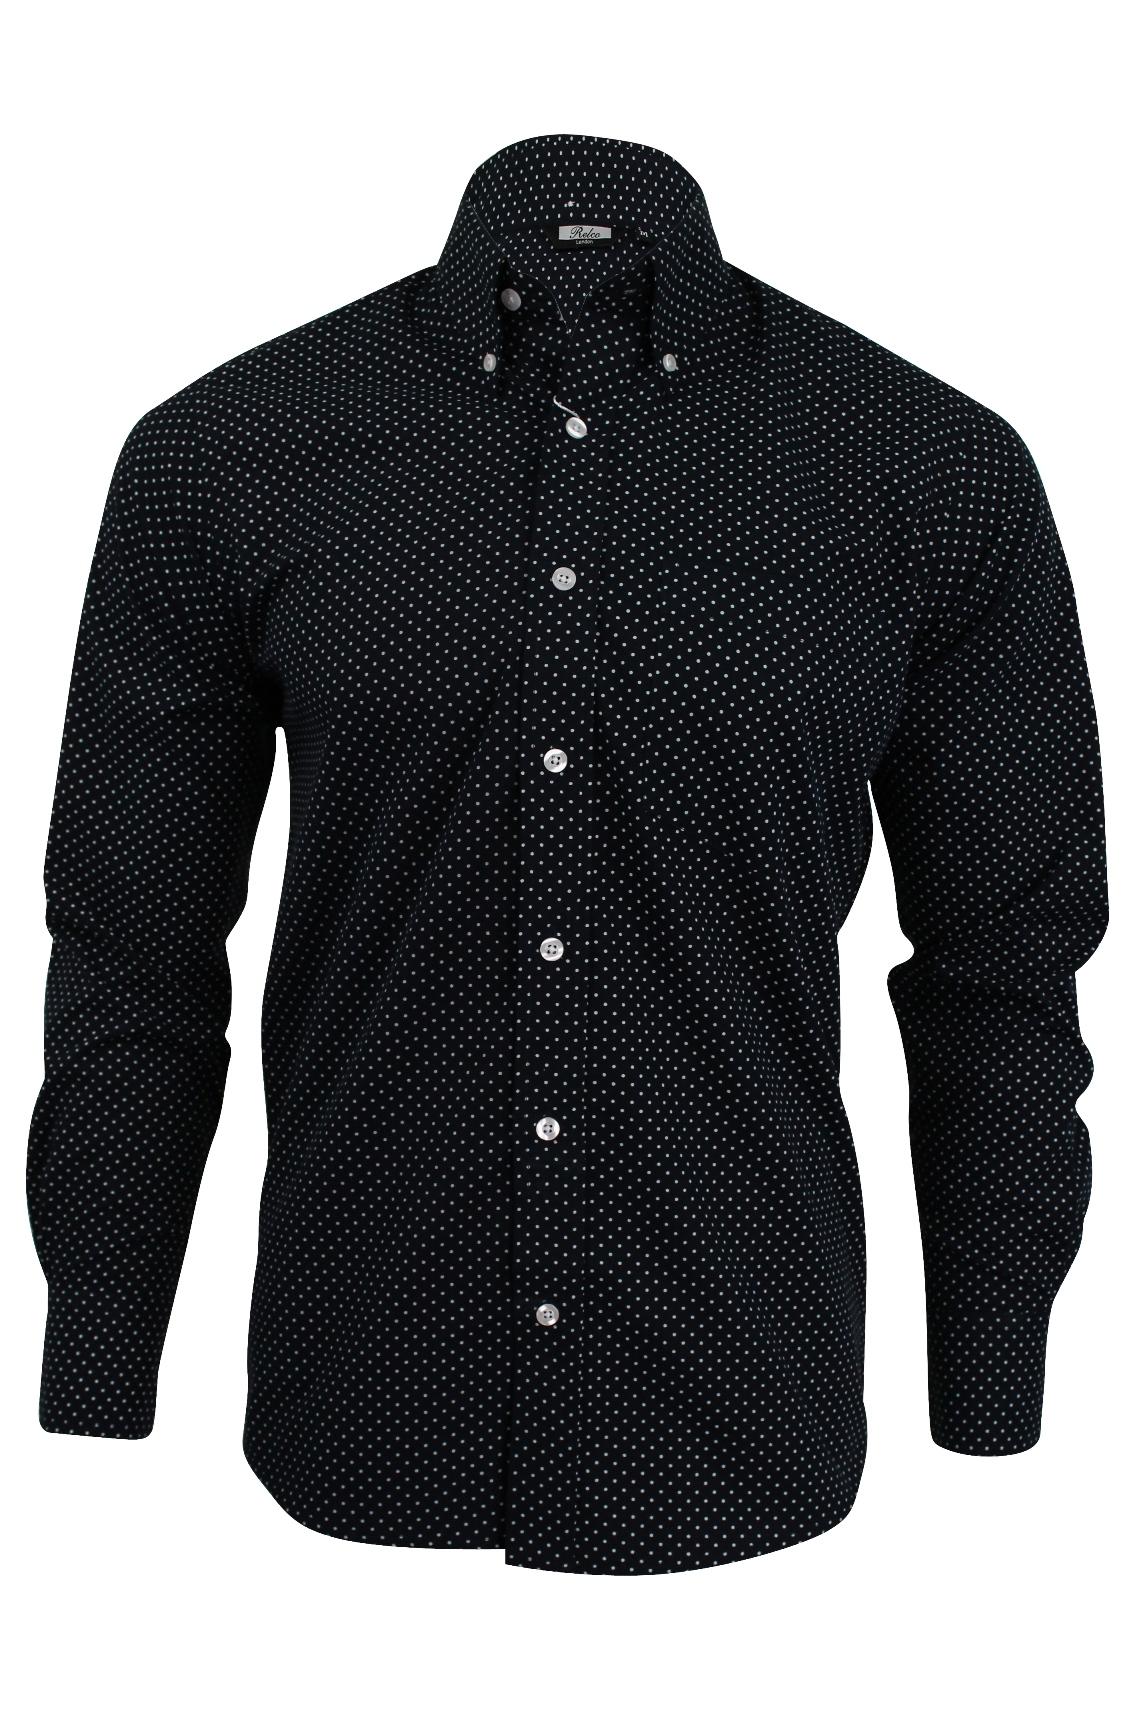 Mens shirt relco mod retro mini polka dot long sleeved for Button down polka dot shirt